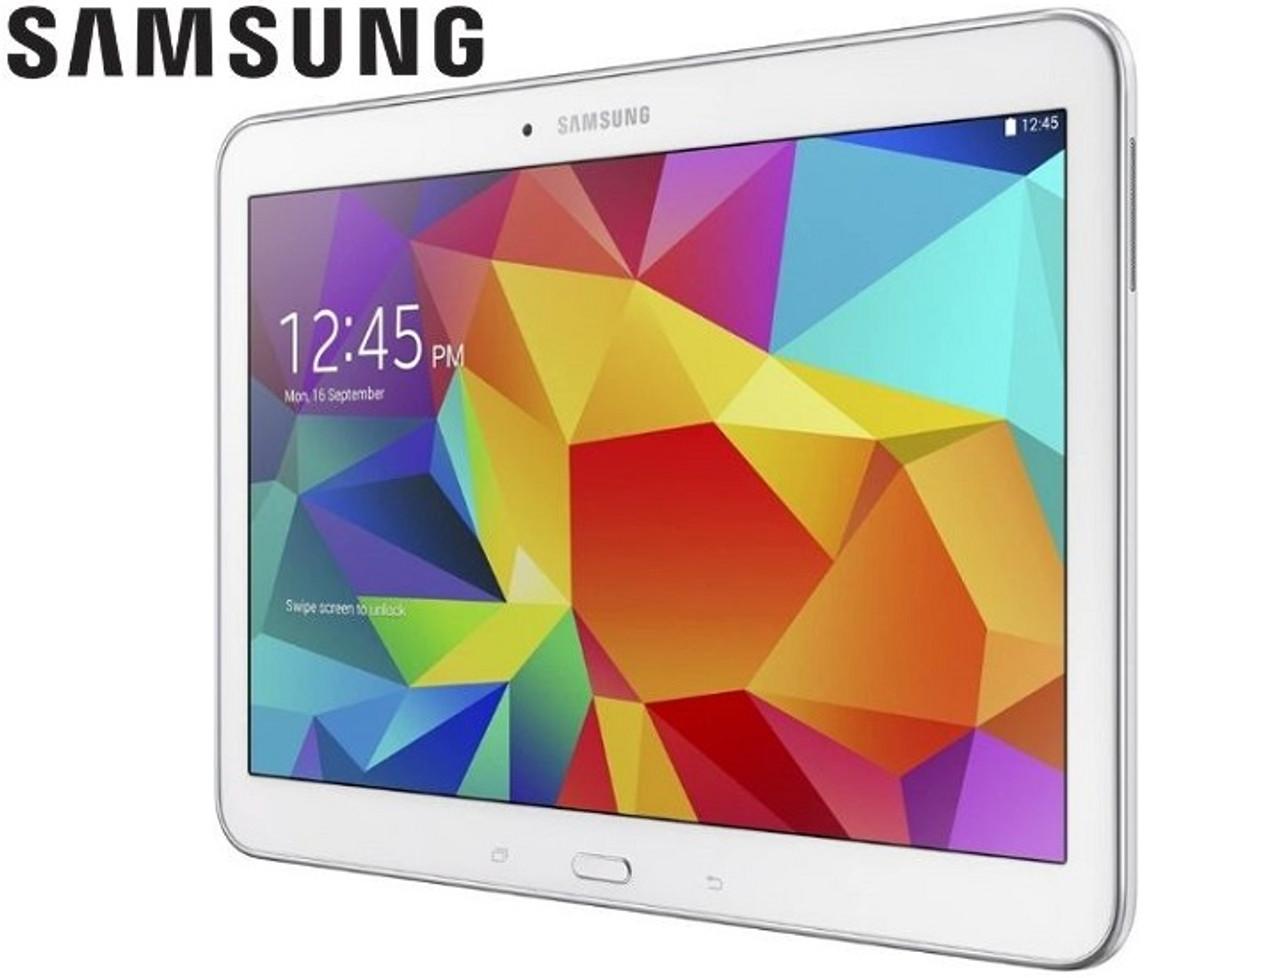 "Samsung Galaxy Tab 4 with 10.1"" HD Display (16GB White) $109.99 (63% OFF)"